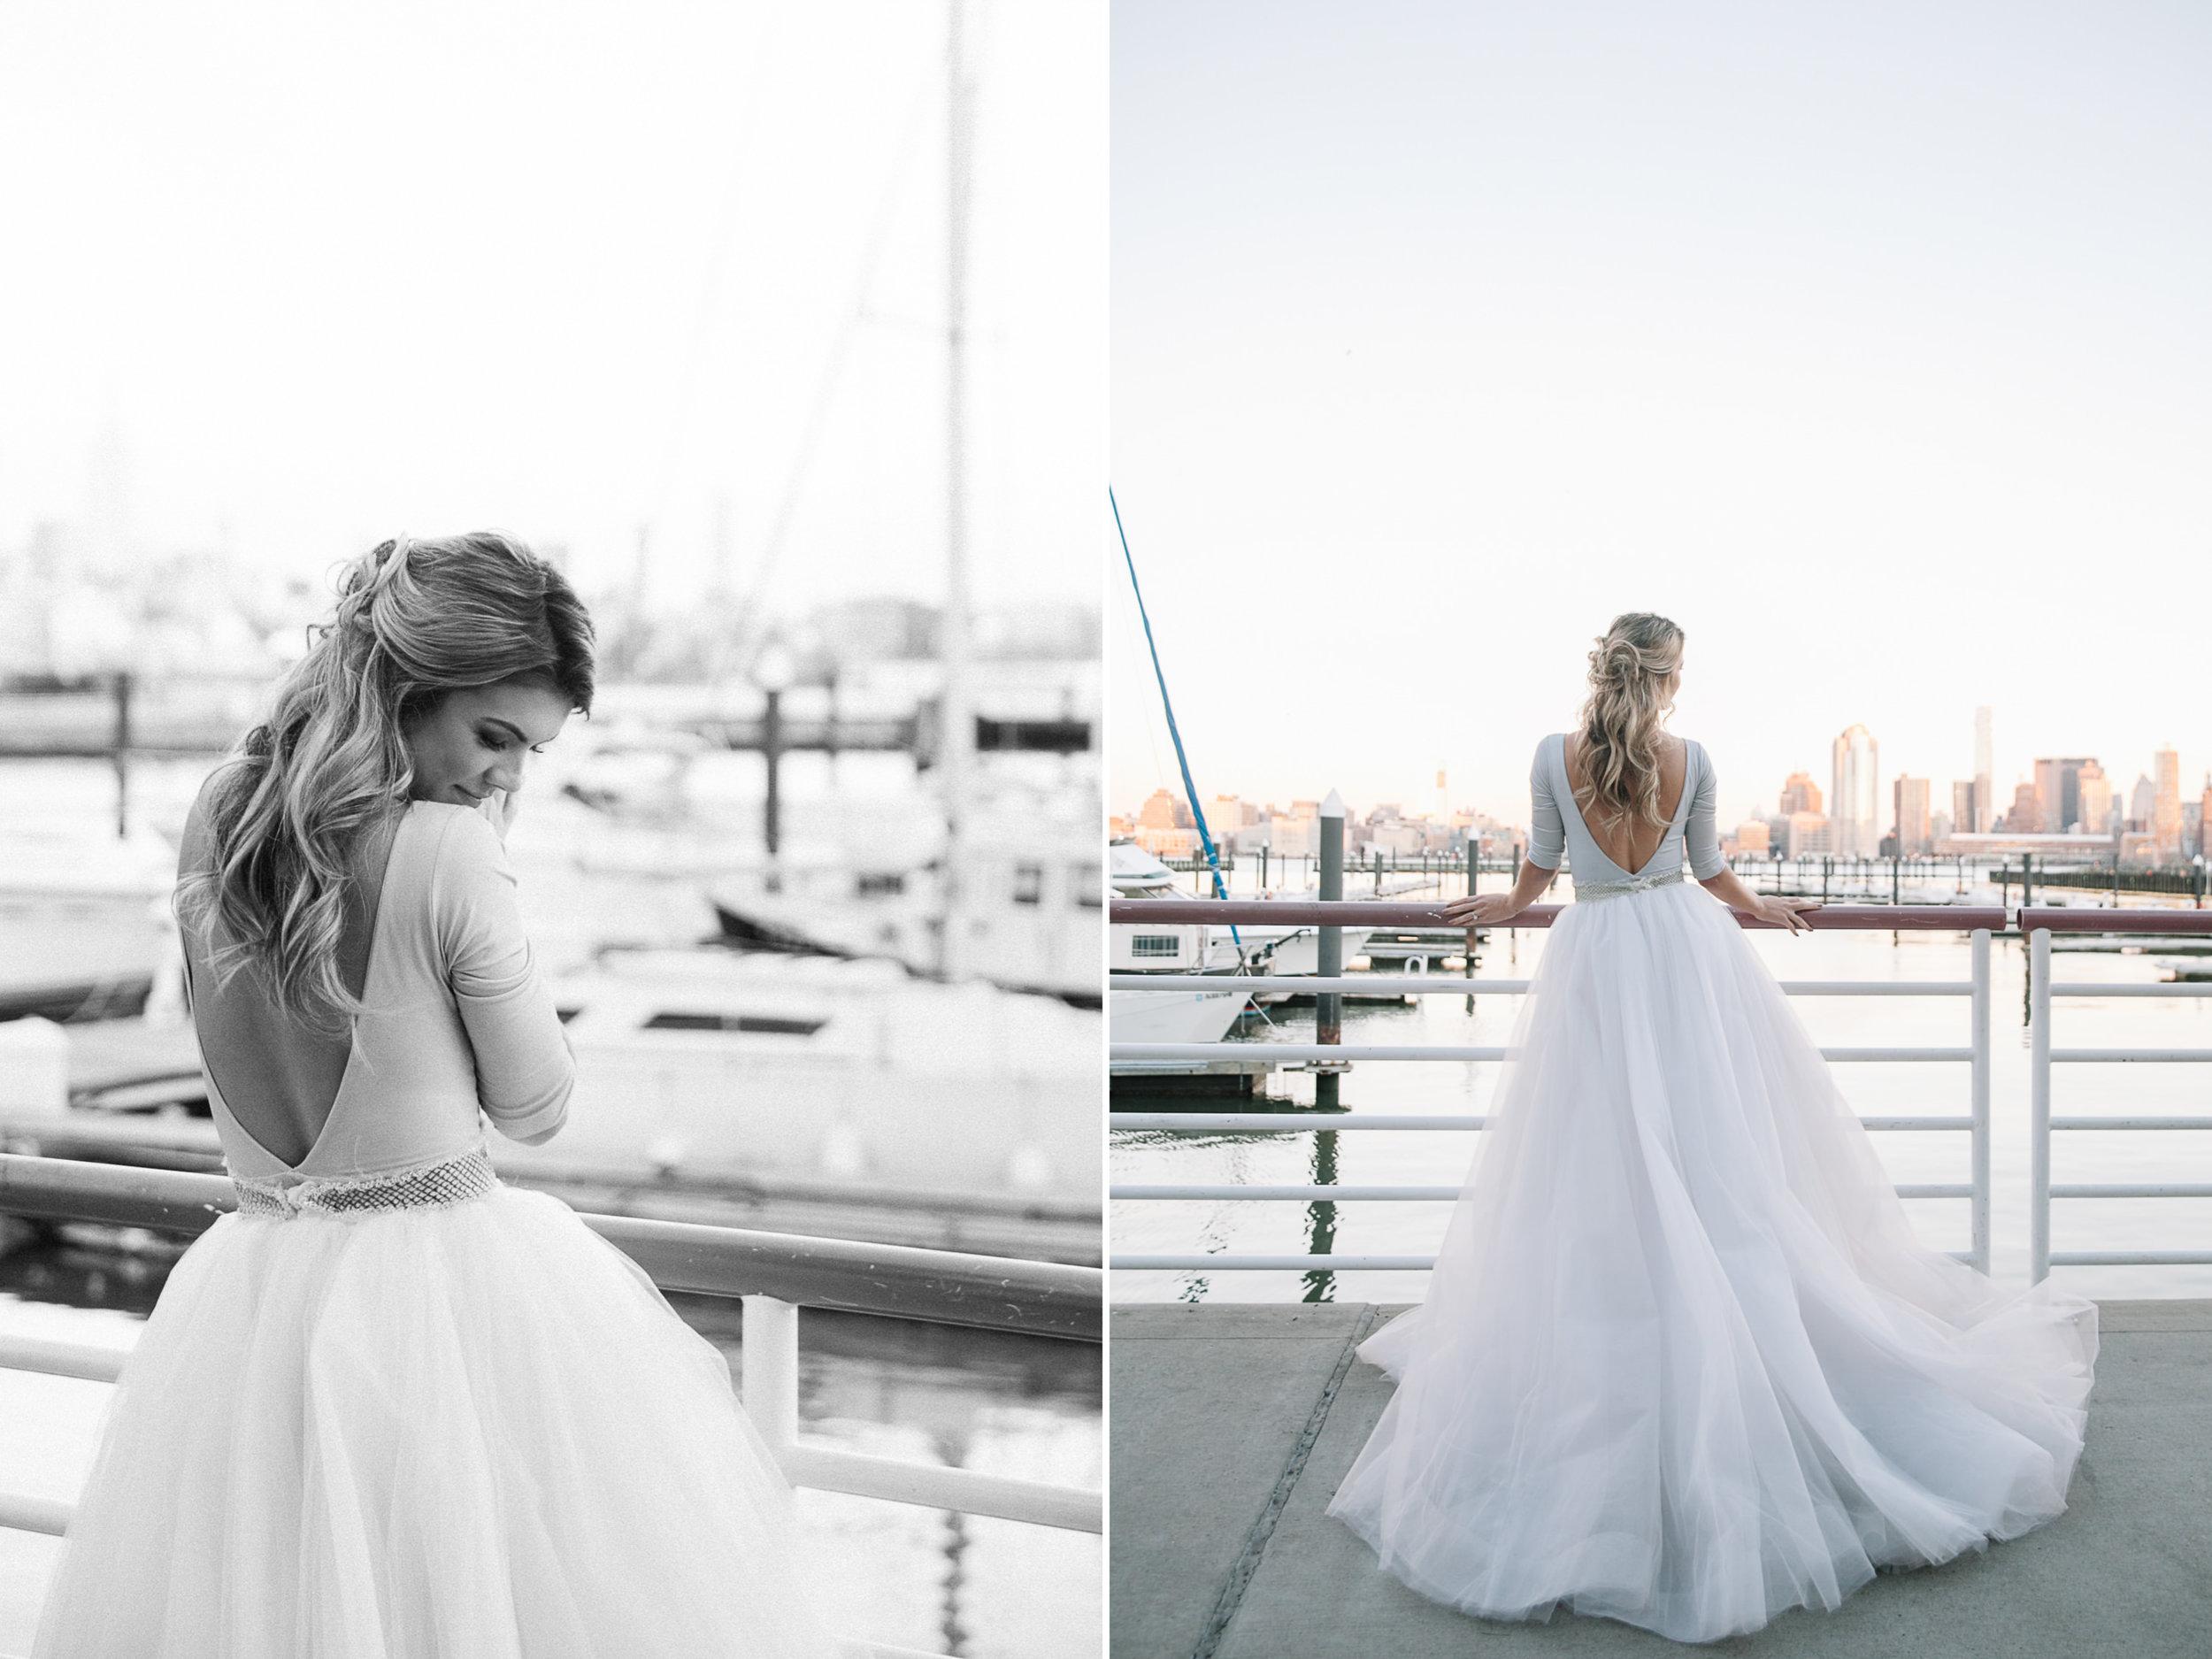 Romantic and Moody Nautical-Inspired Styled Shoot-25.jpg